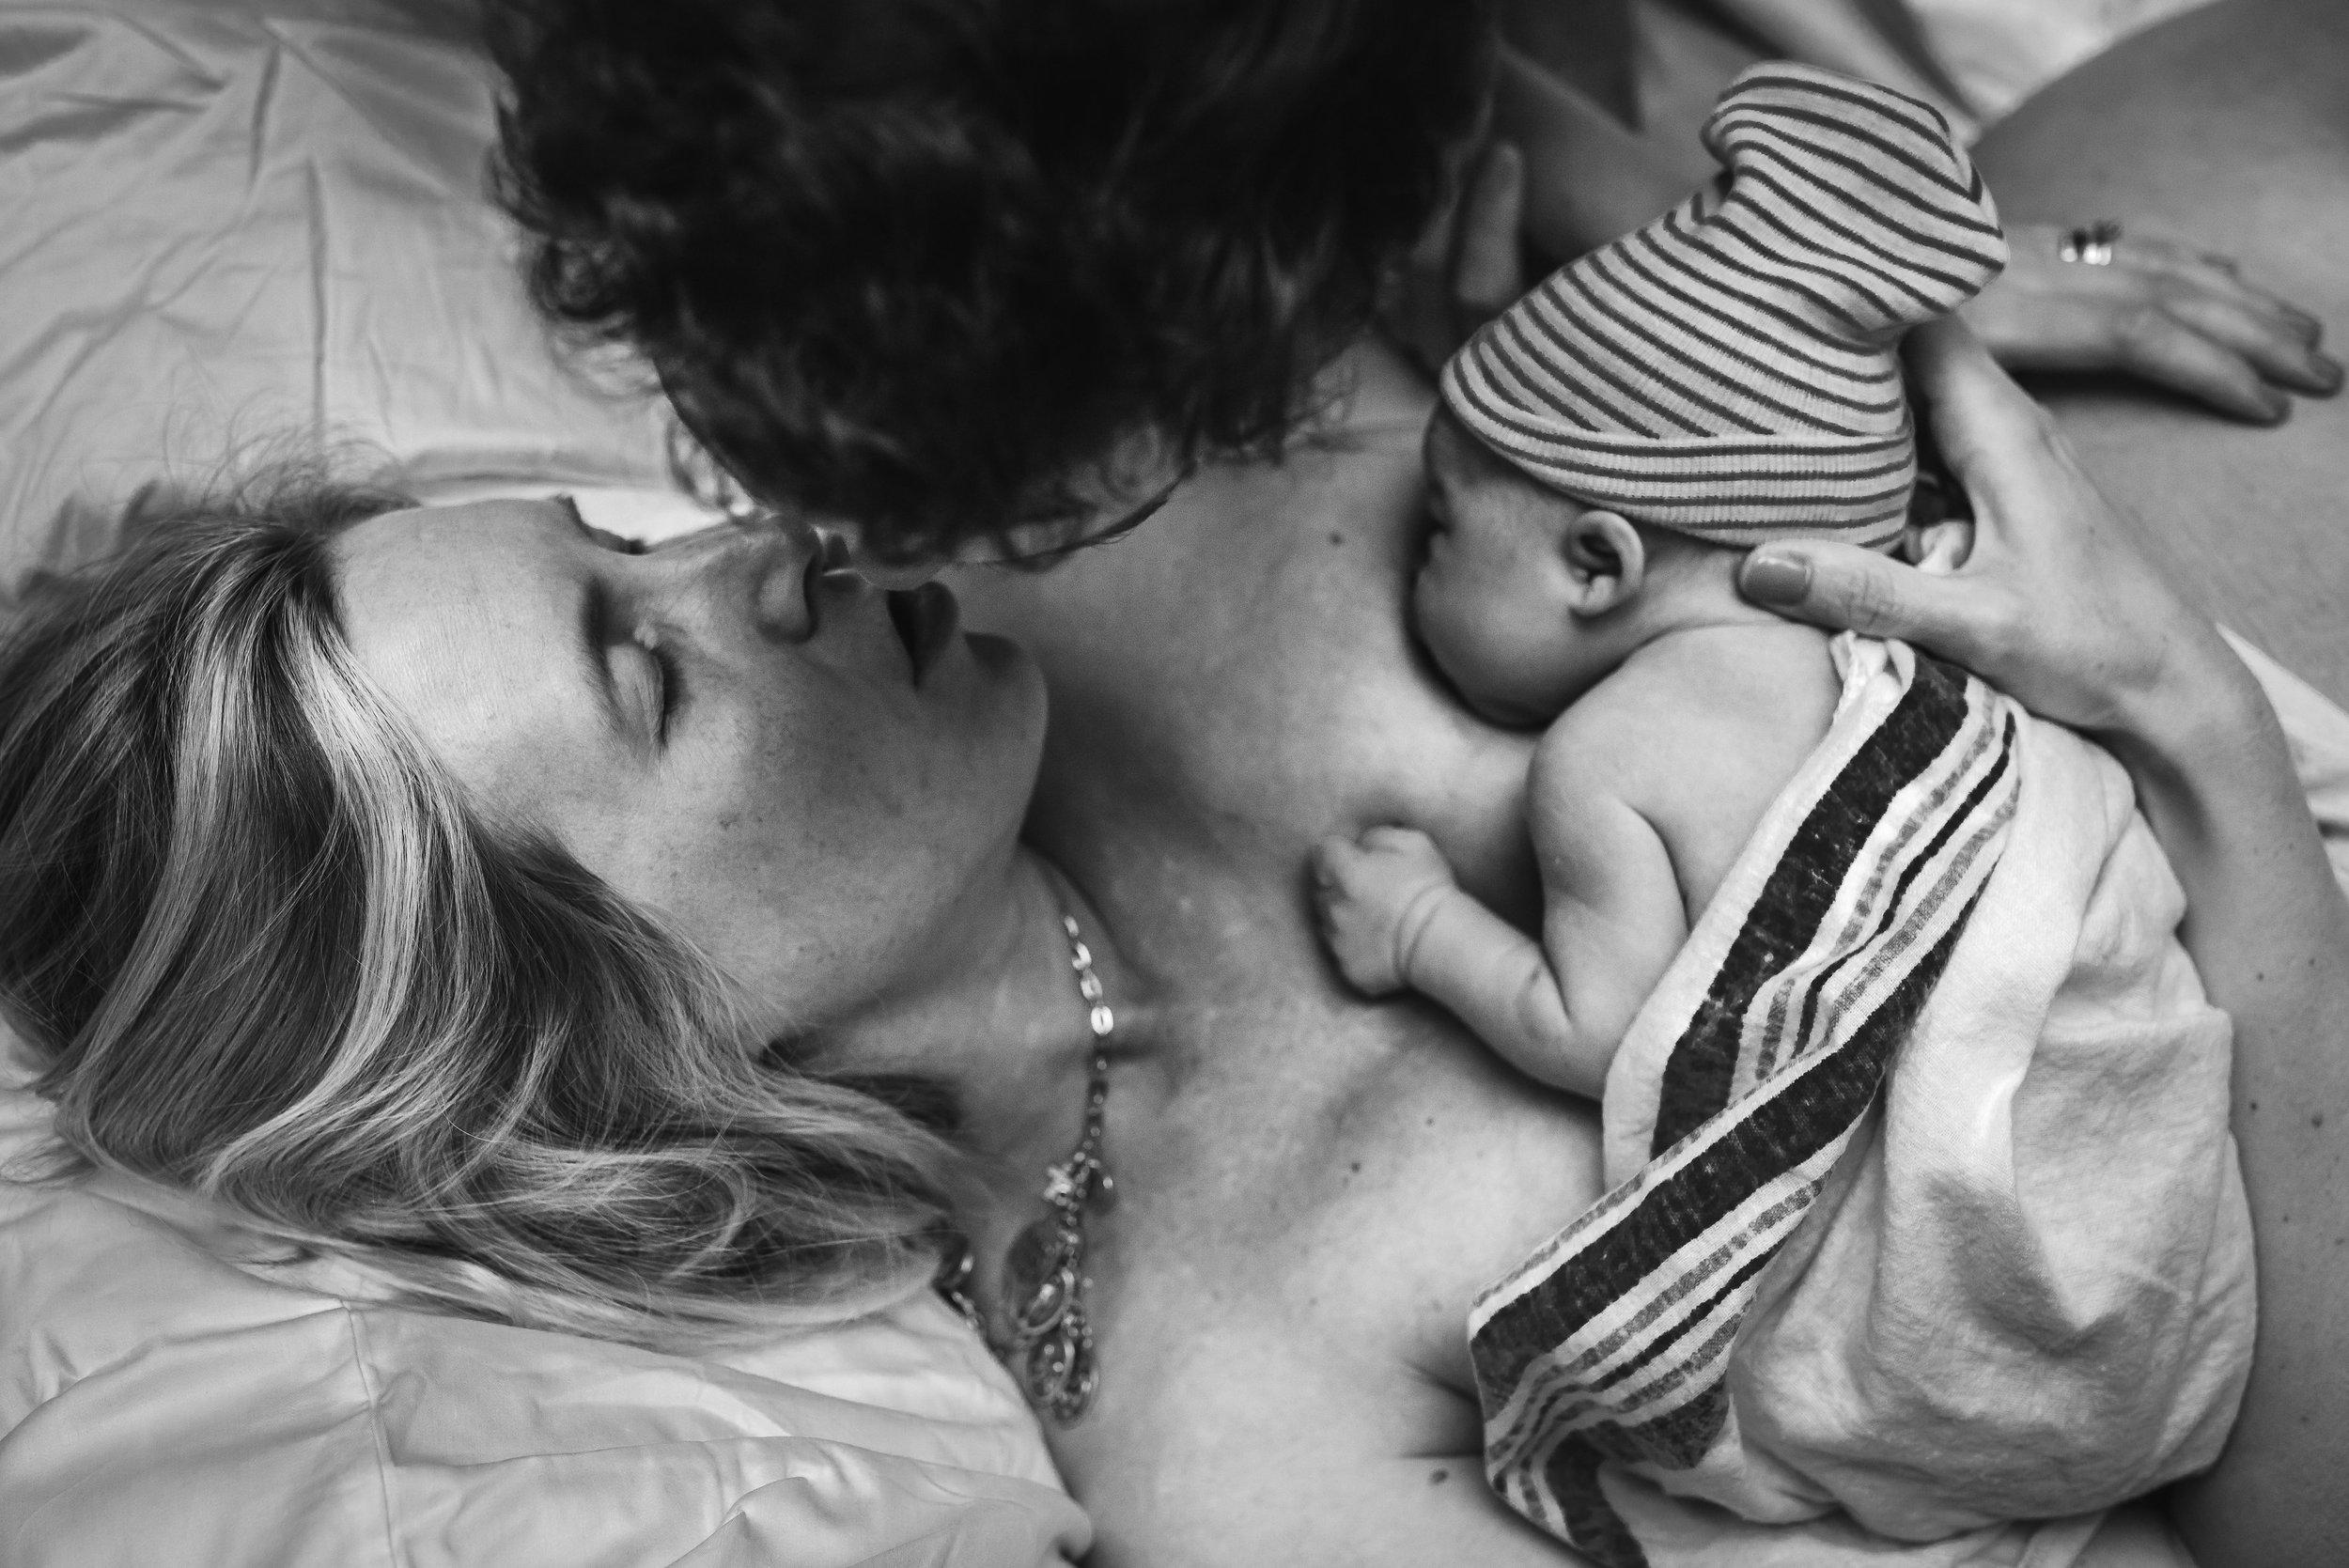 breastfeeding-images-birth-photography-denver-center-for-birth